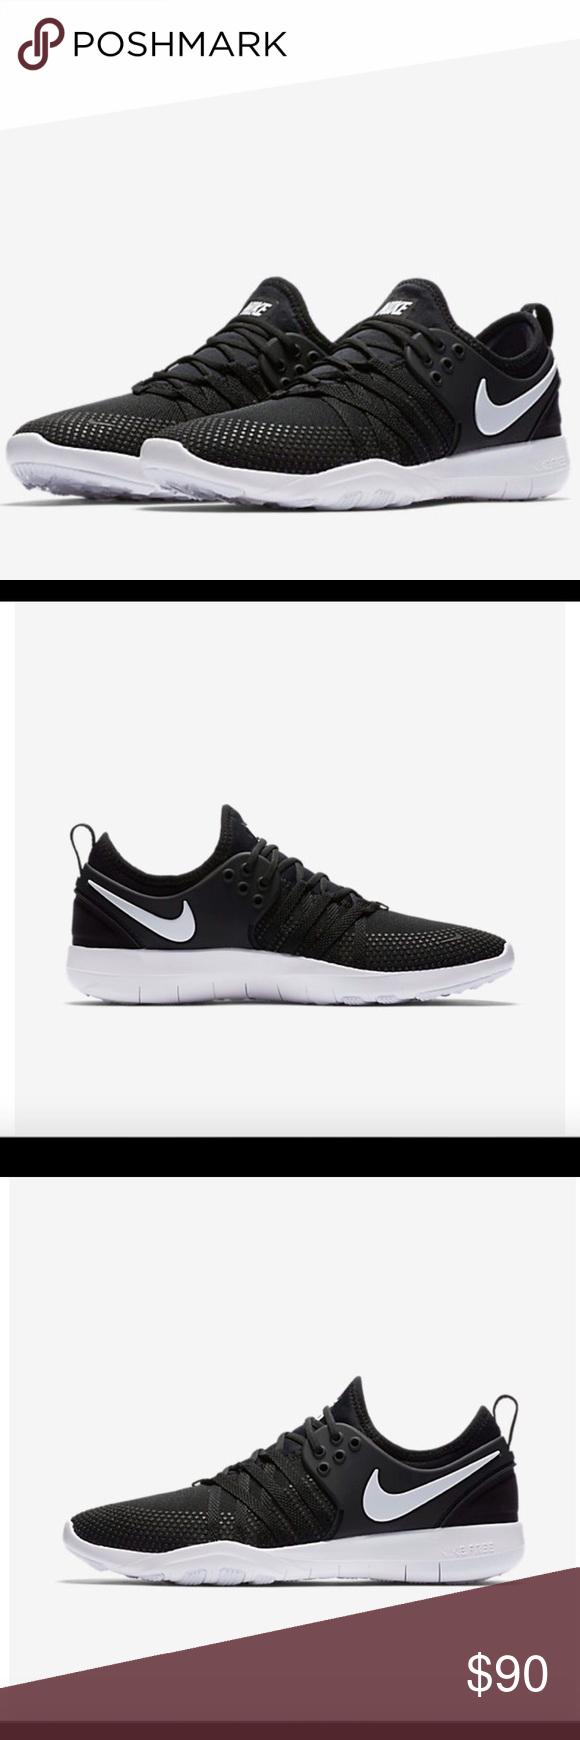 los angeles 80806 d5cdc Women's Nike Free TR7 Training Shoe *Brand New* Nike women's ...